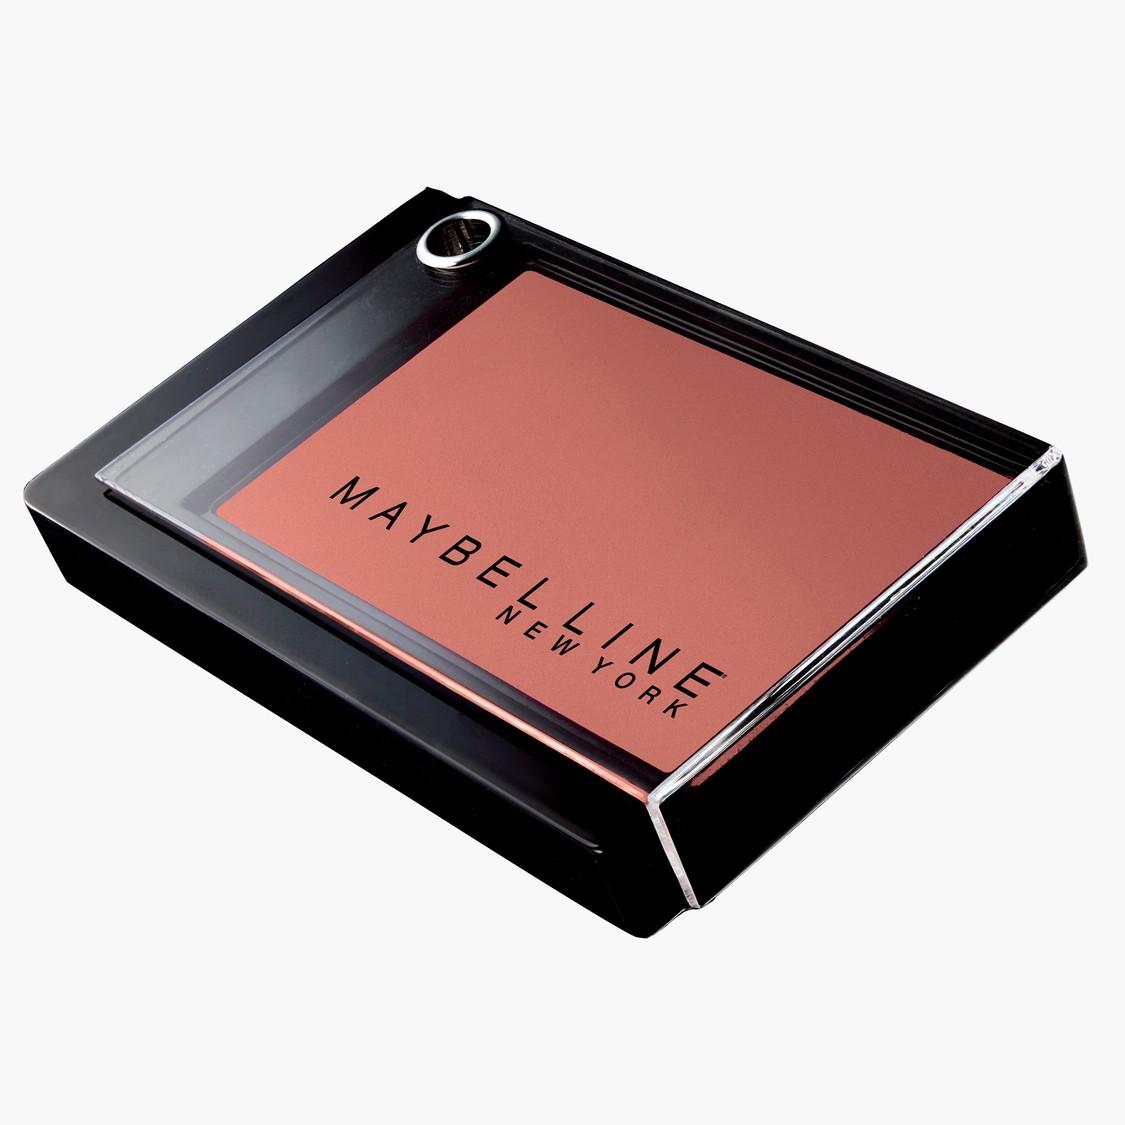 Maybelline New York Face Studio Master Heat Blush